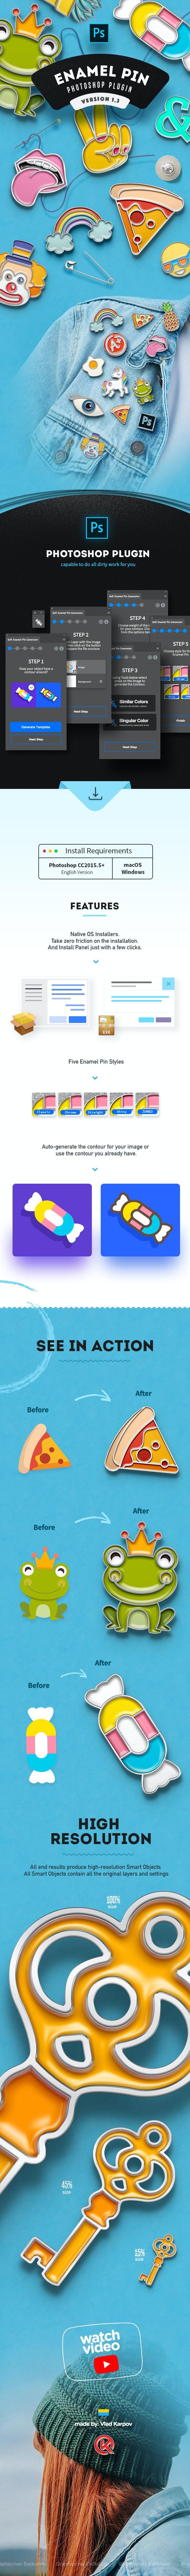 Enamel Pin - Actions Photoshop